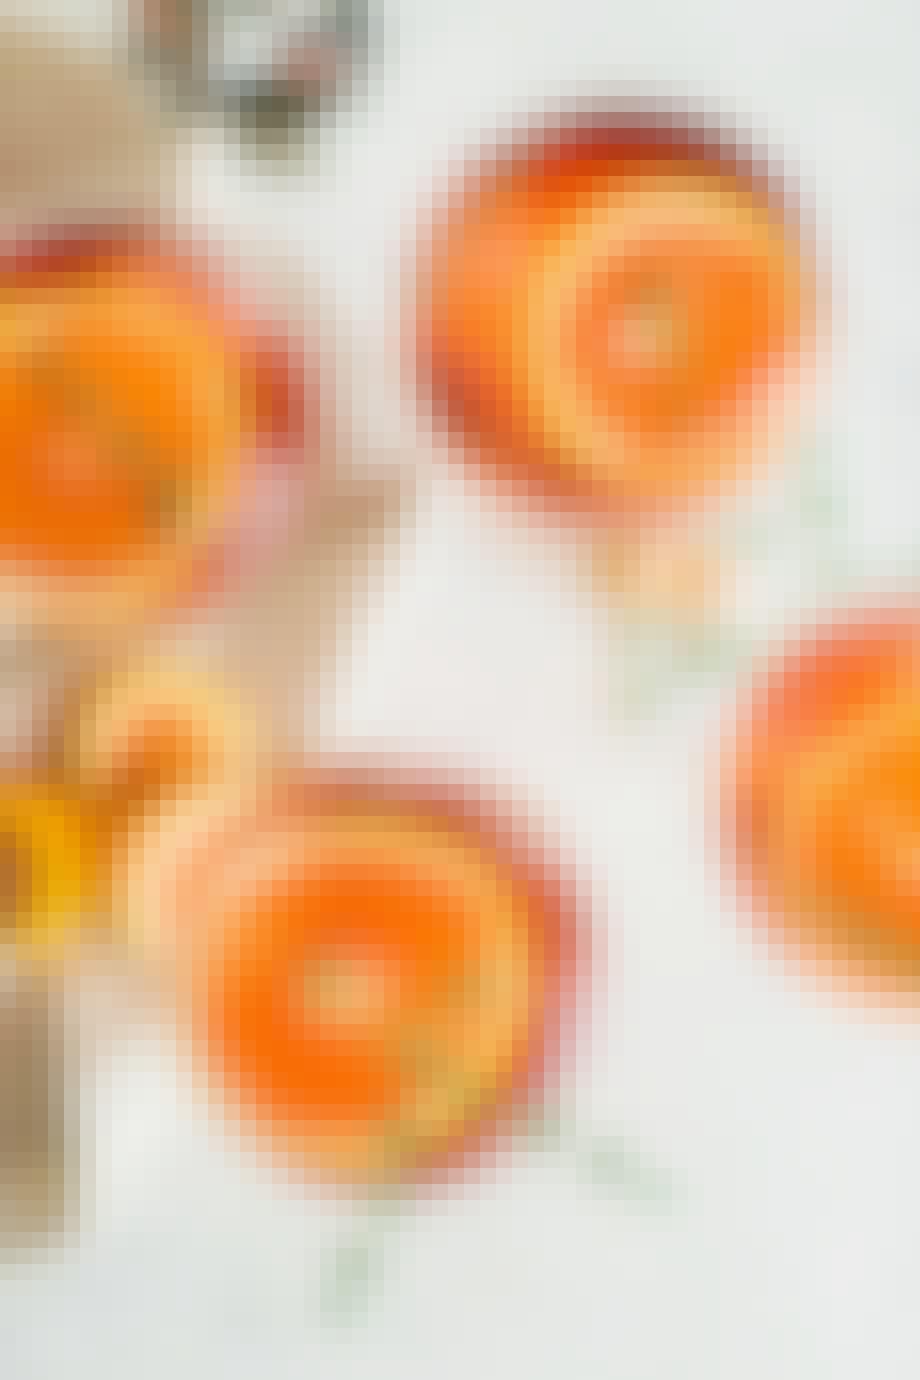 Klassisk italiensk aperol spritz